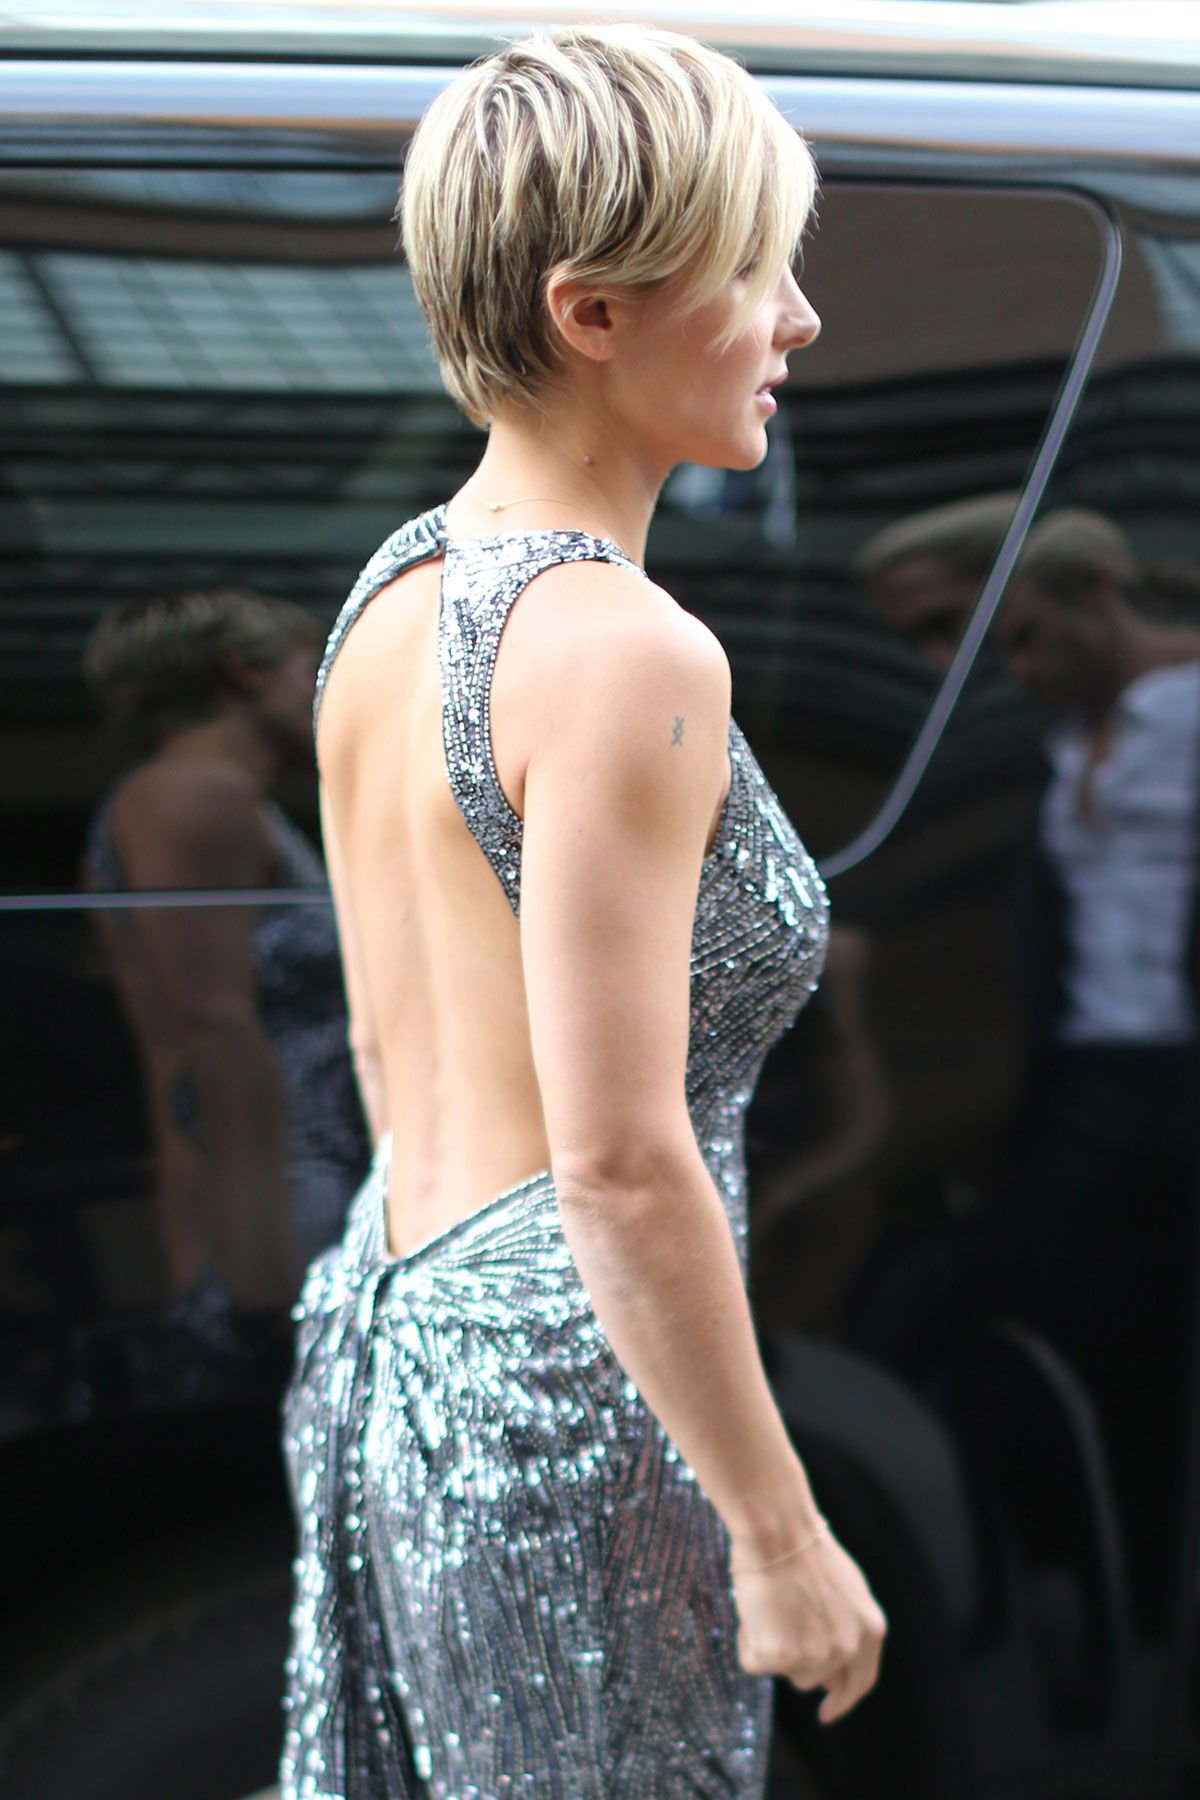 Elsa Pataky Leaving Her Hotel in New York April 2013